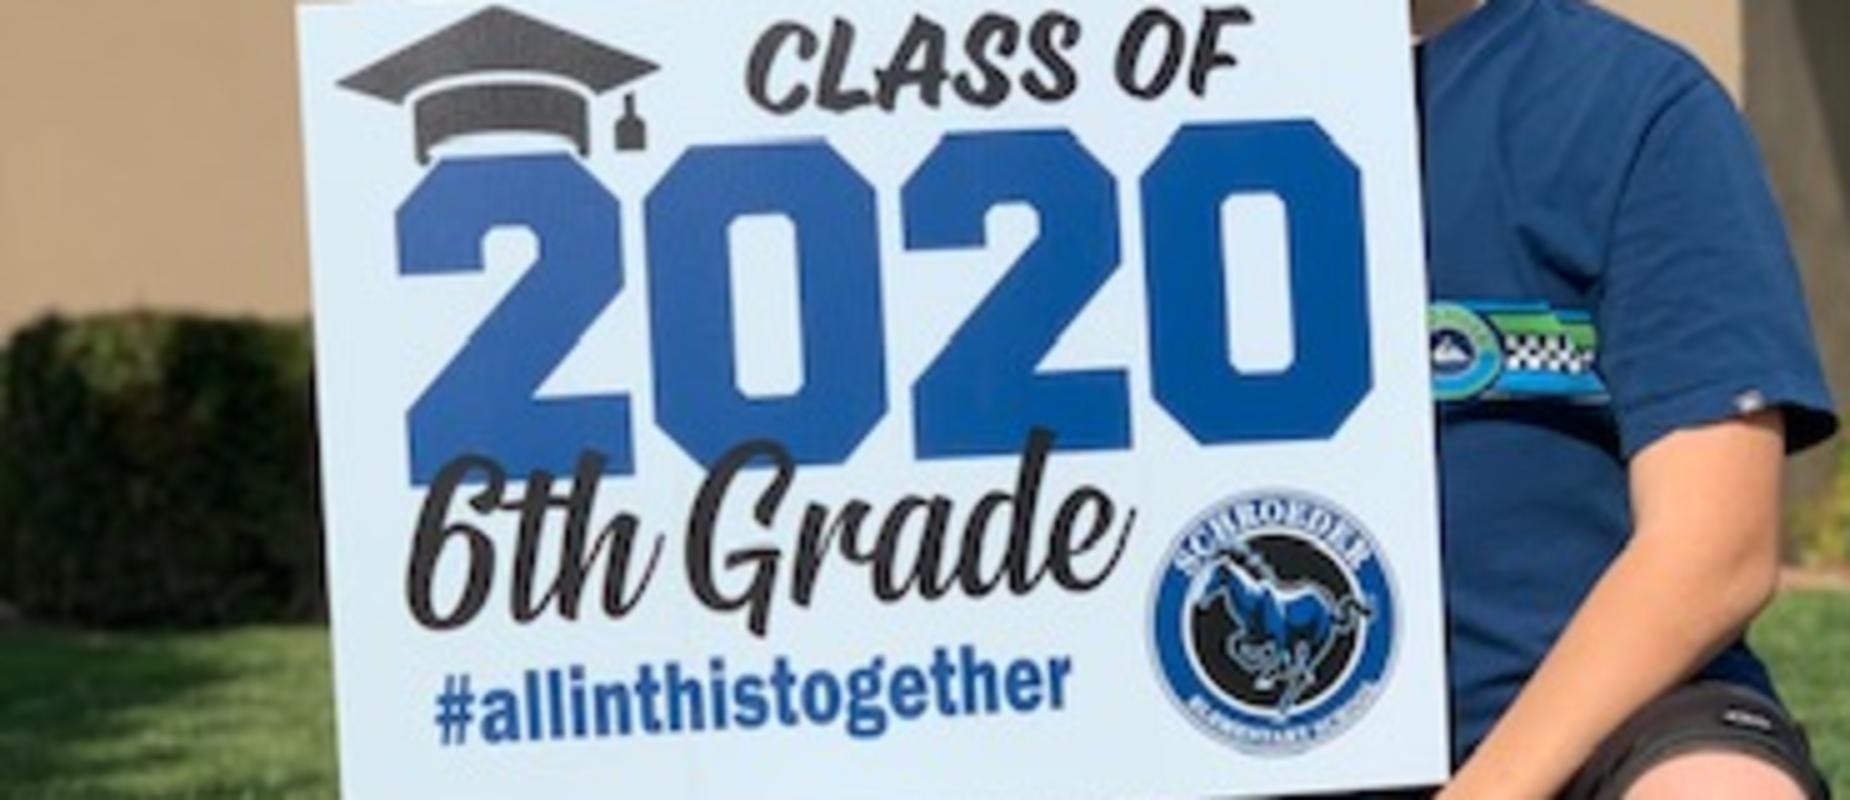 6th grade sign